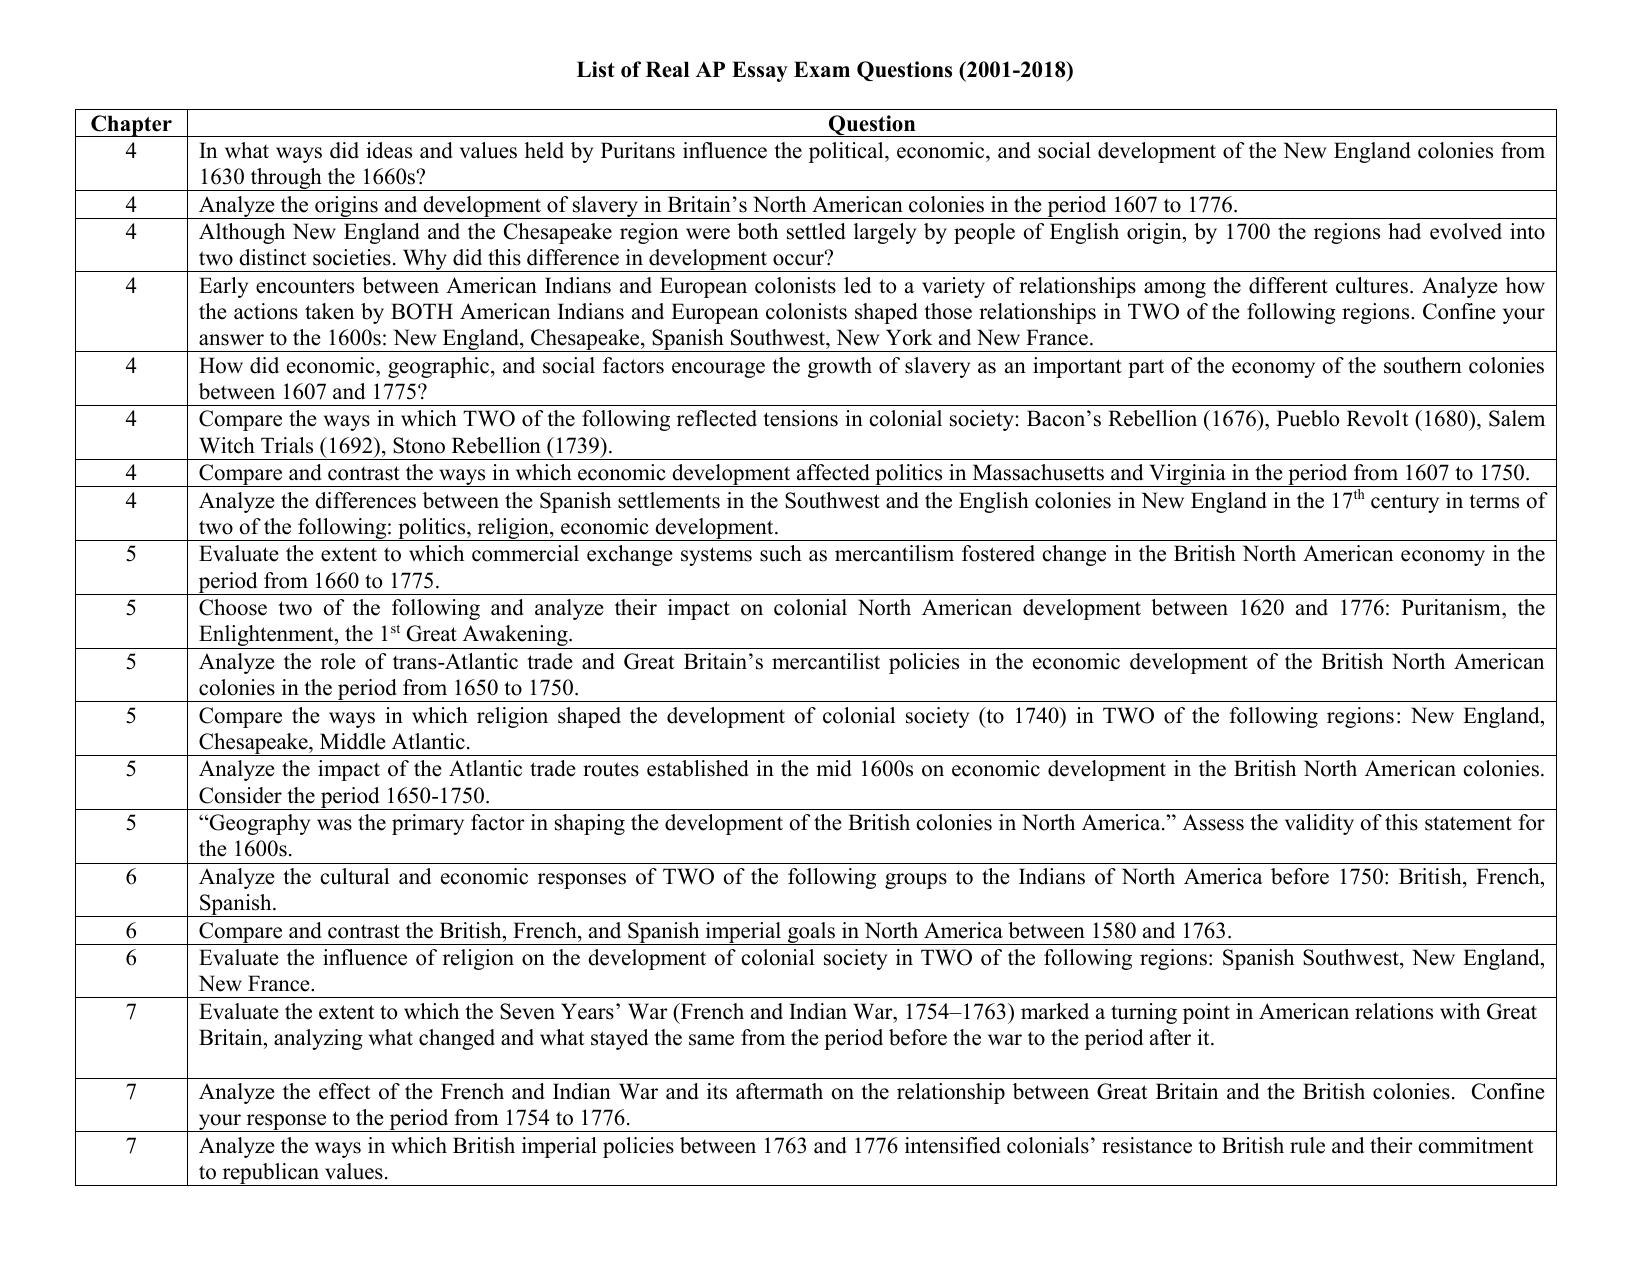 AP U.S. History Long Essay Example Essay - Kaplan Test Prep